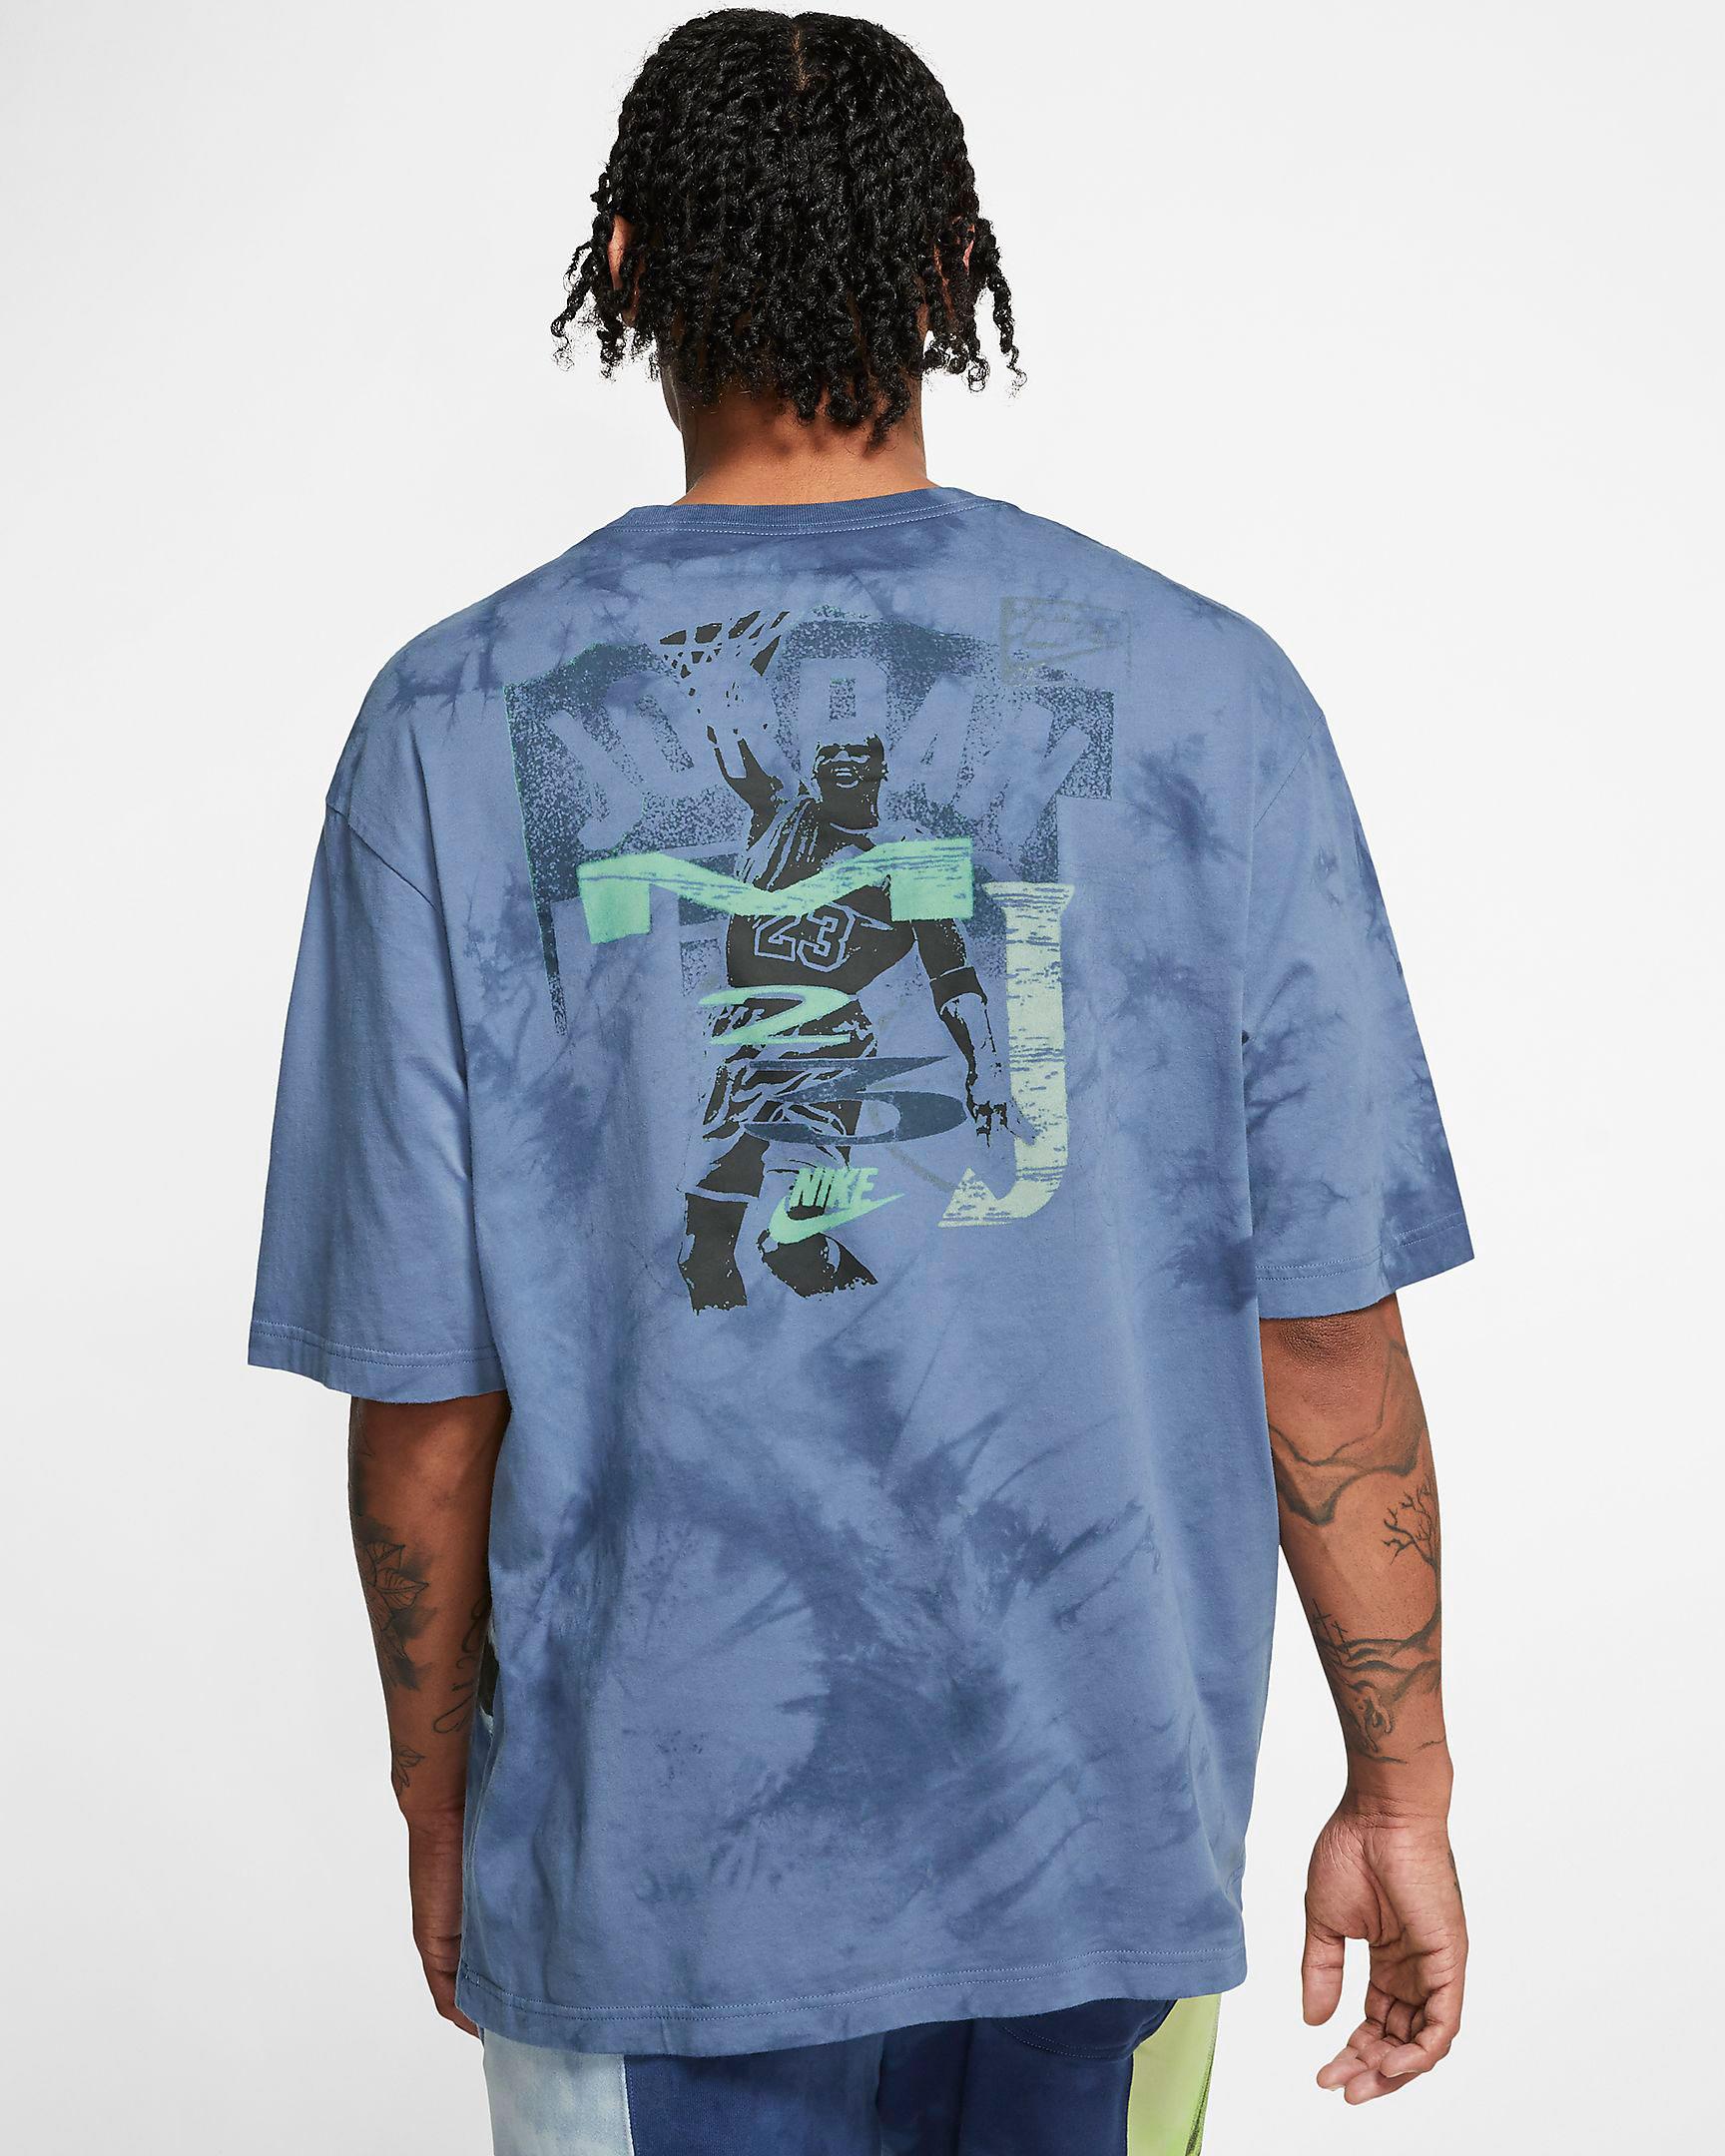 jordan-9-smoke-grey-racer-blue-shirt-match-2